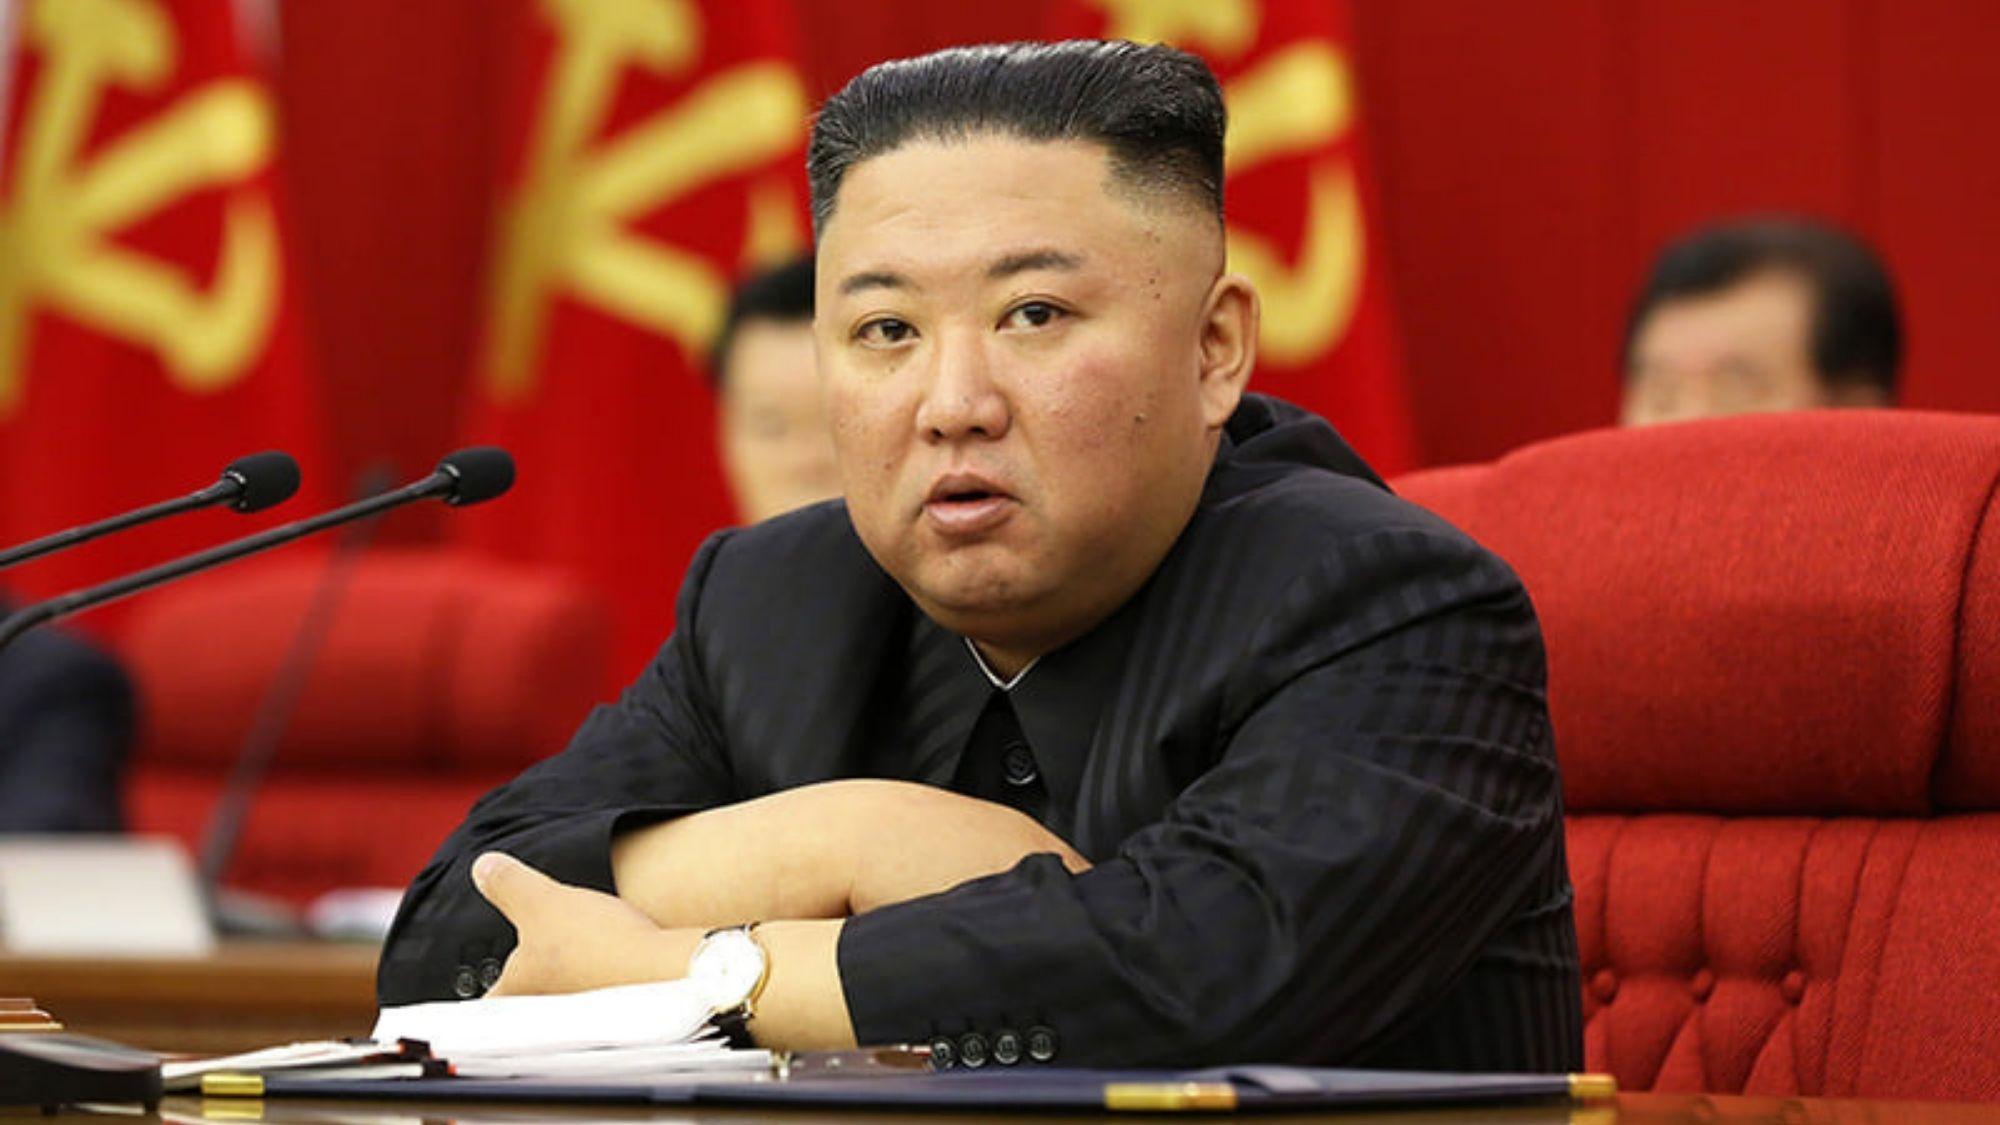 Kim Jong Un loses weight, says NoKor state media